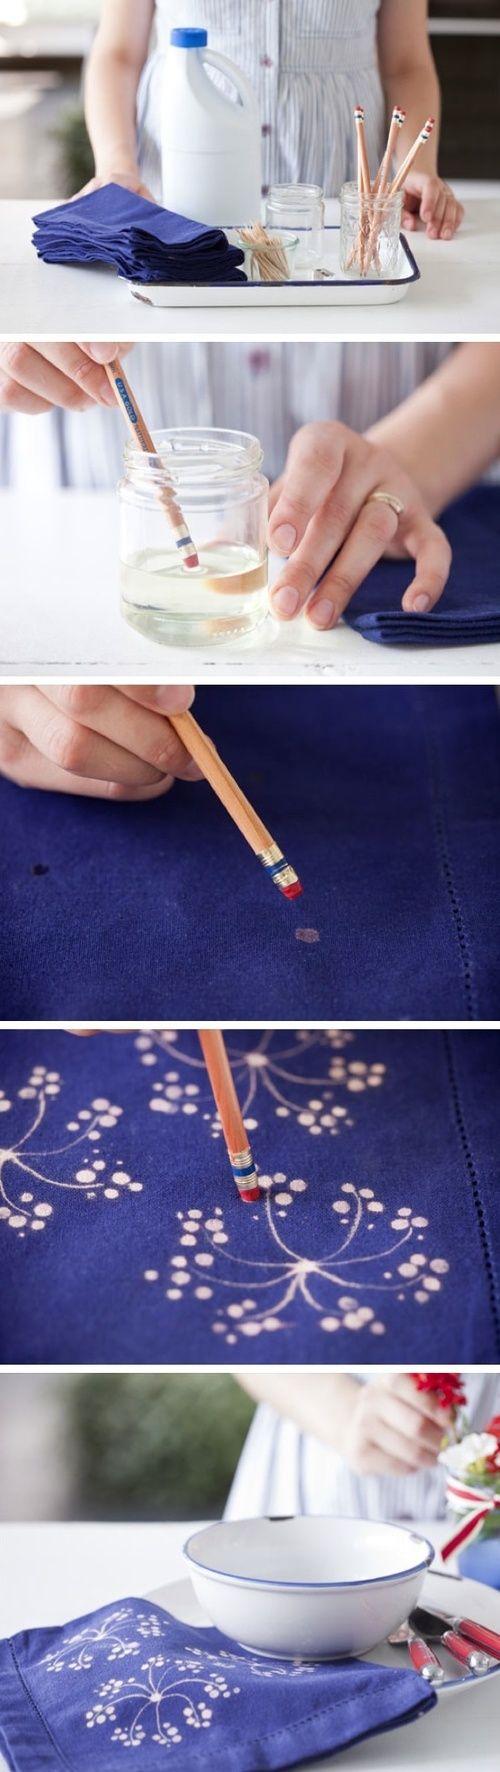 Fantastic Idea. Fabric Bleach Art. | Art preparations